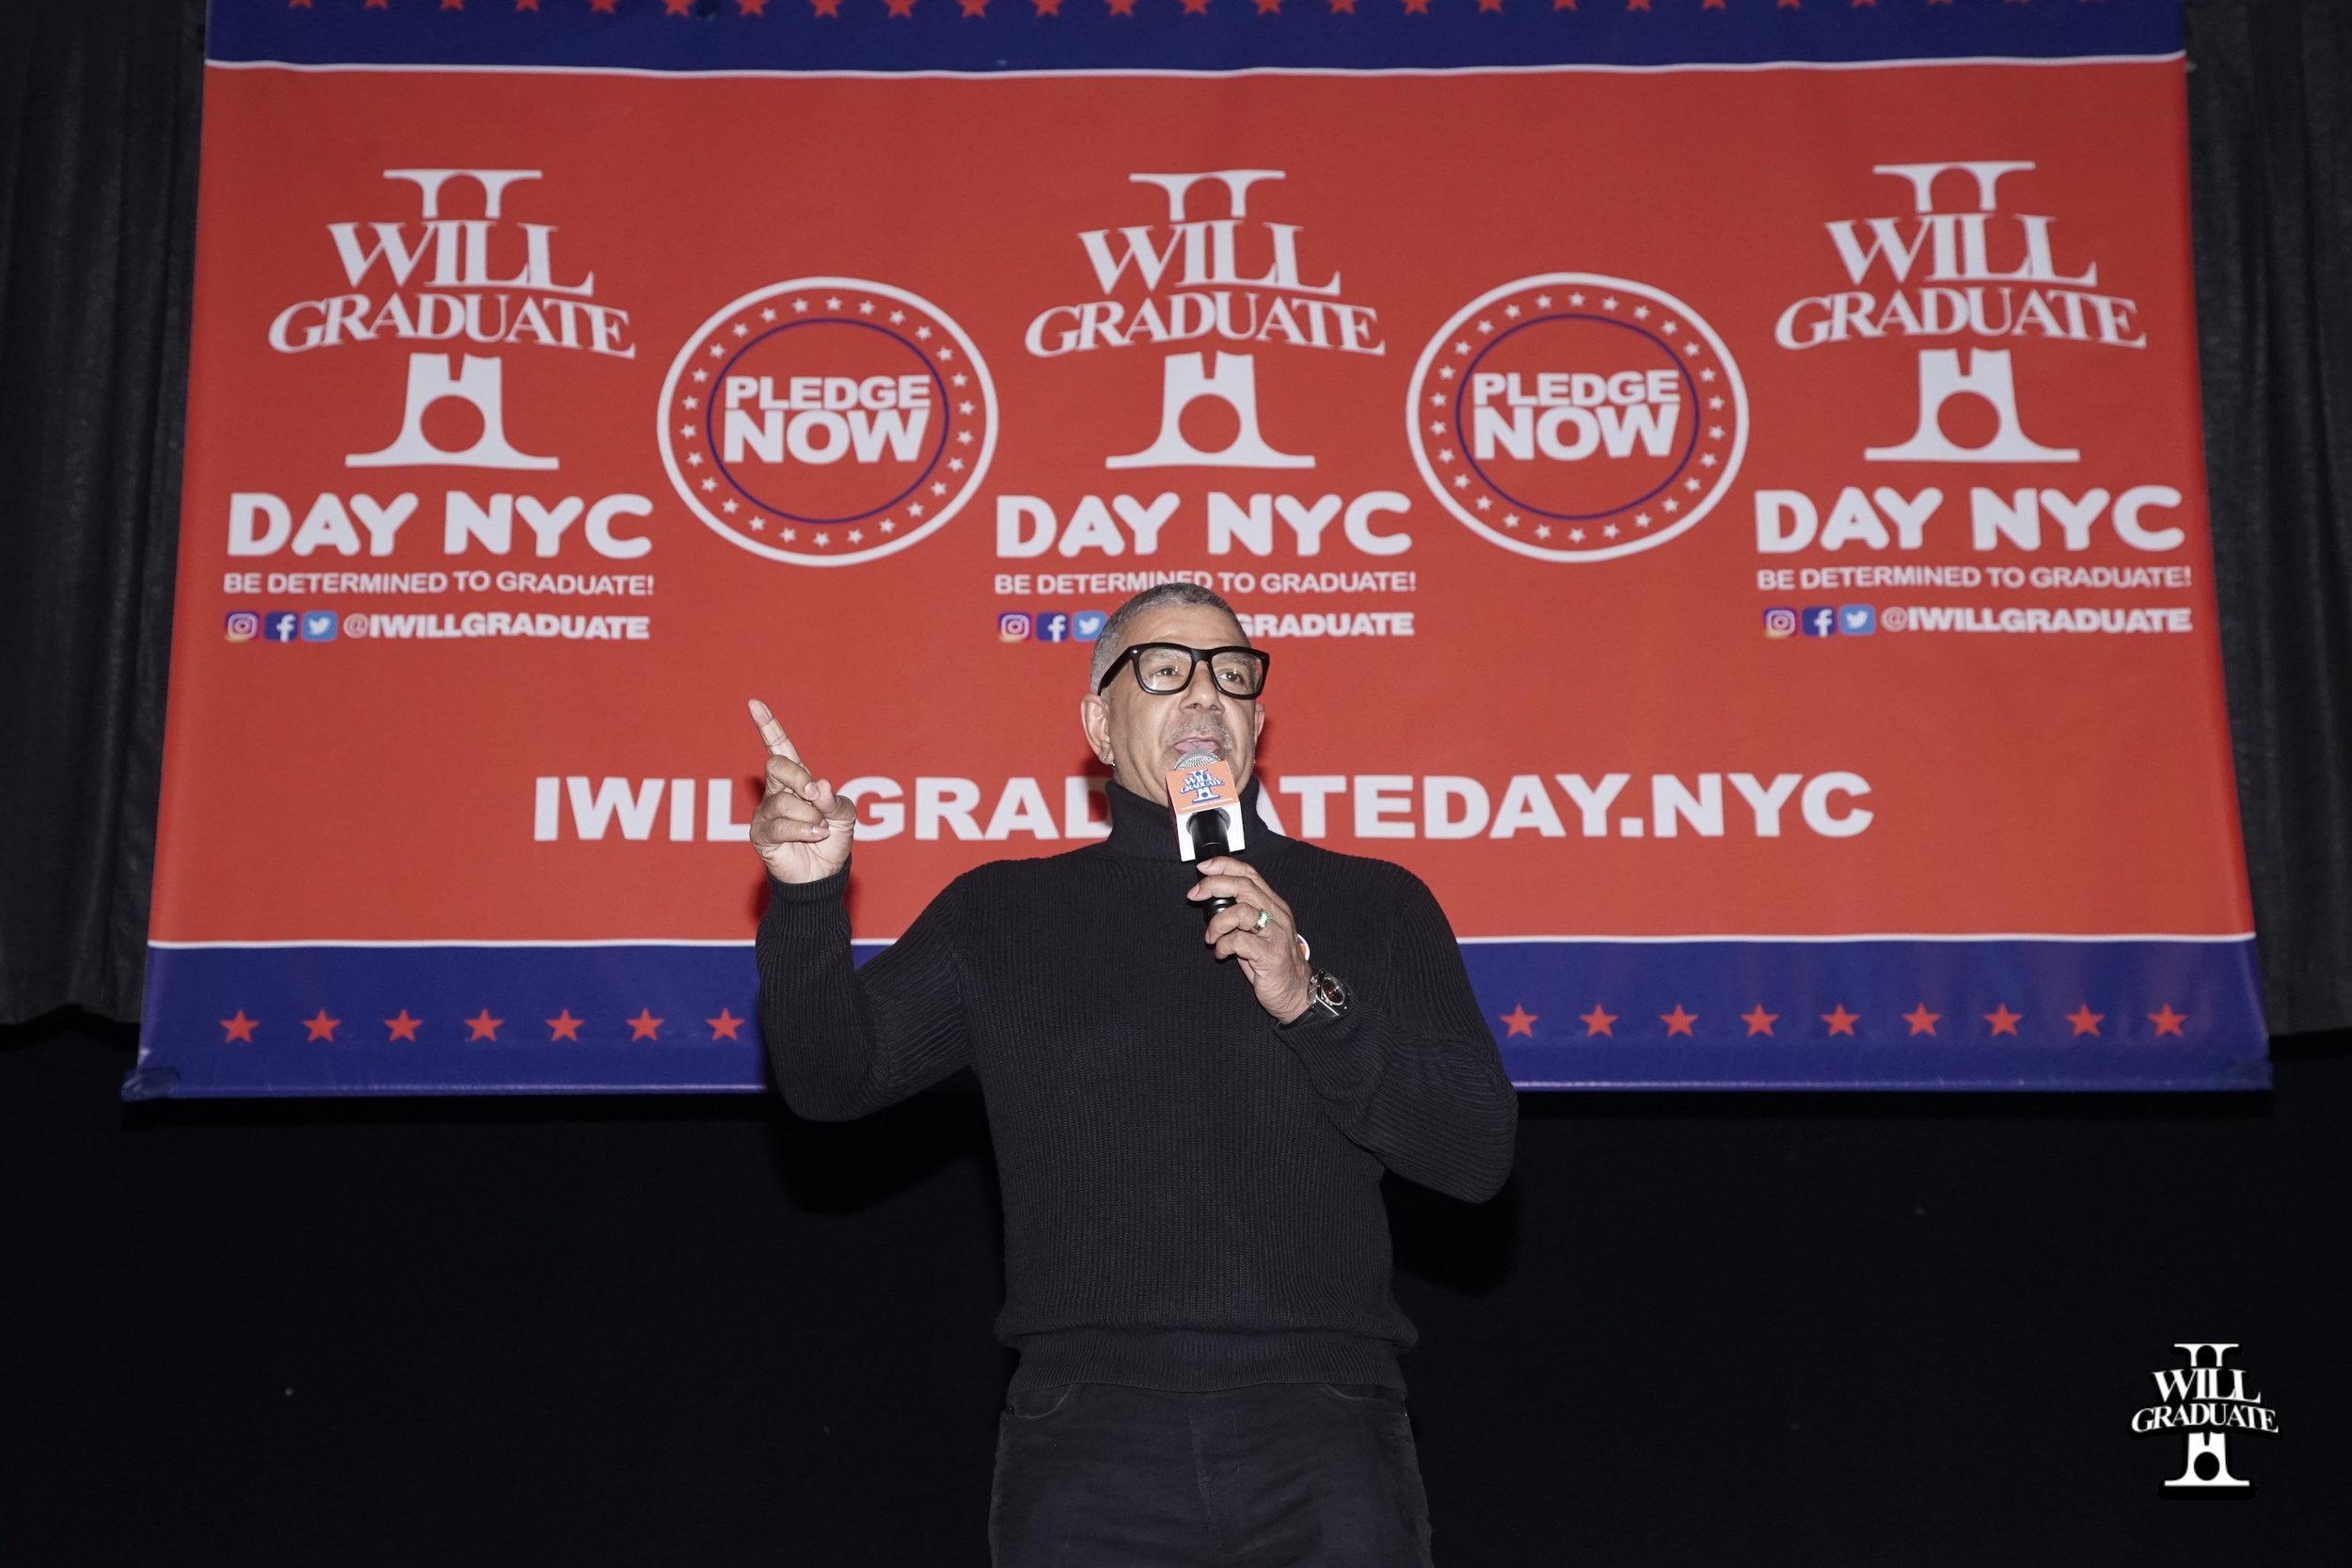 Comedian Ray DeJon at I WILL GRADUATE DAY